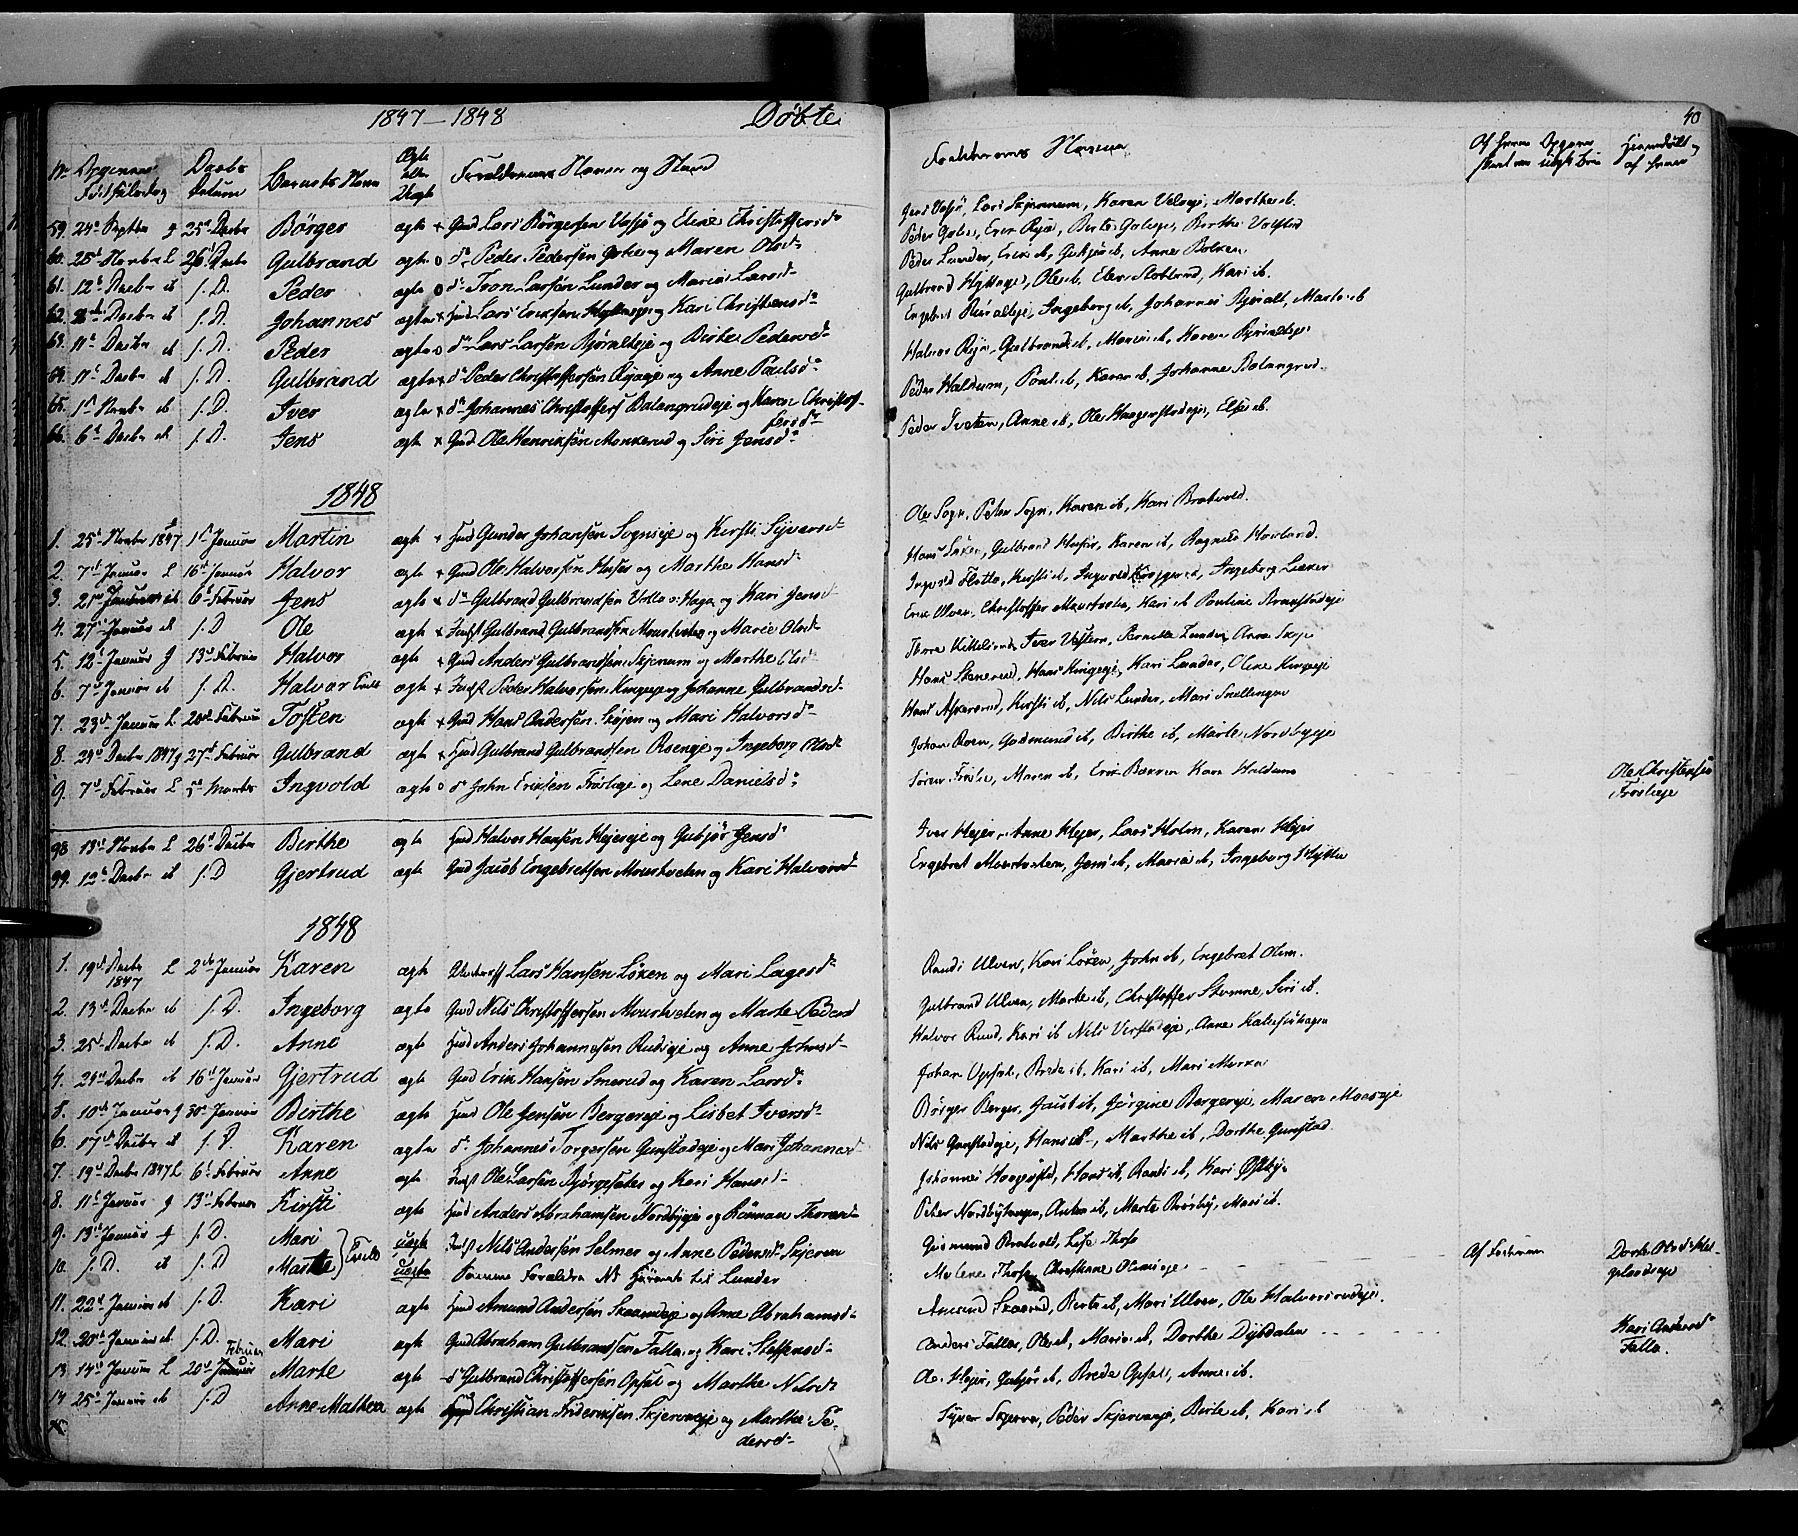 SAH, Jevnaker prestekontor, Ministerialbok nr. 6, 1837-1857, s. 40